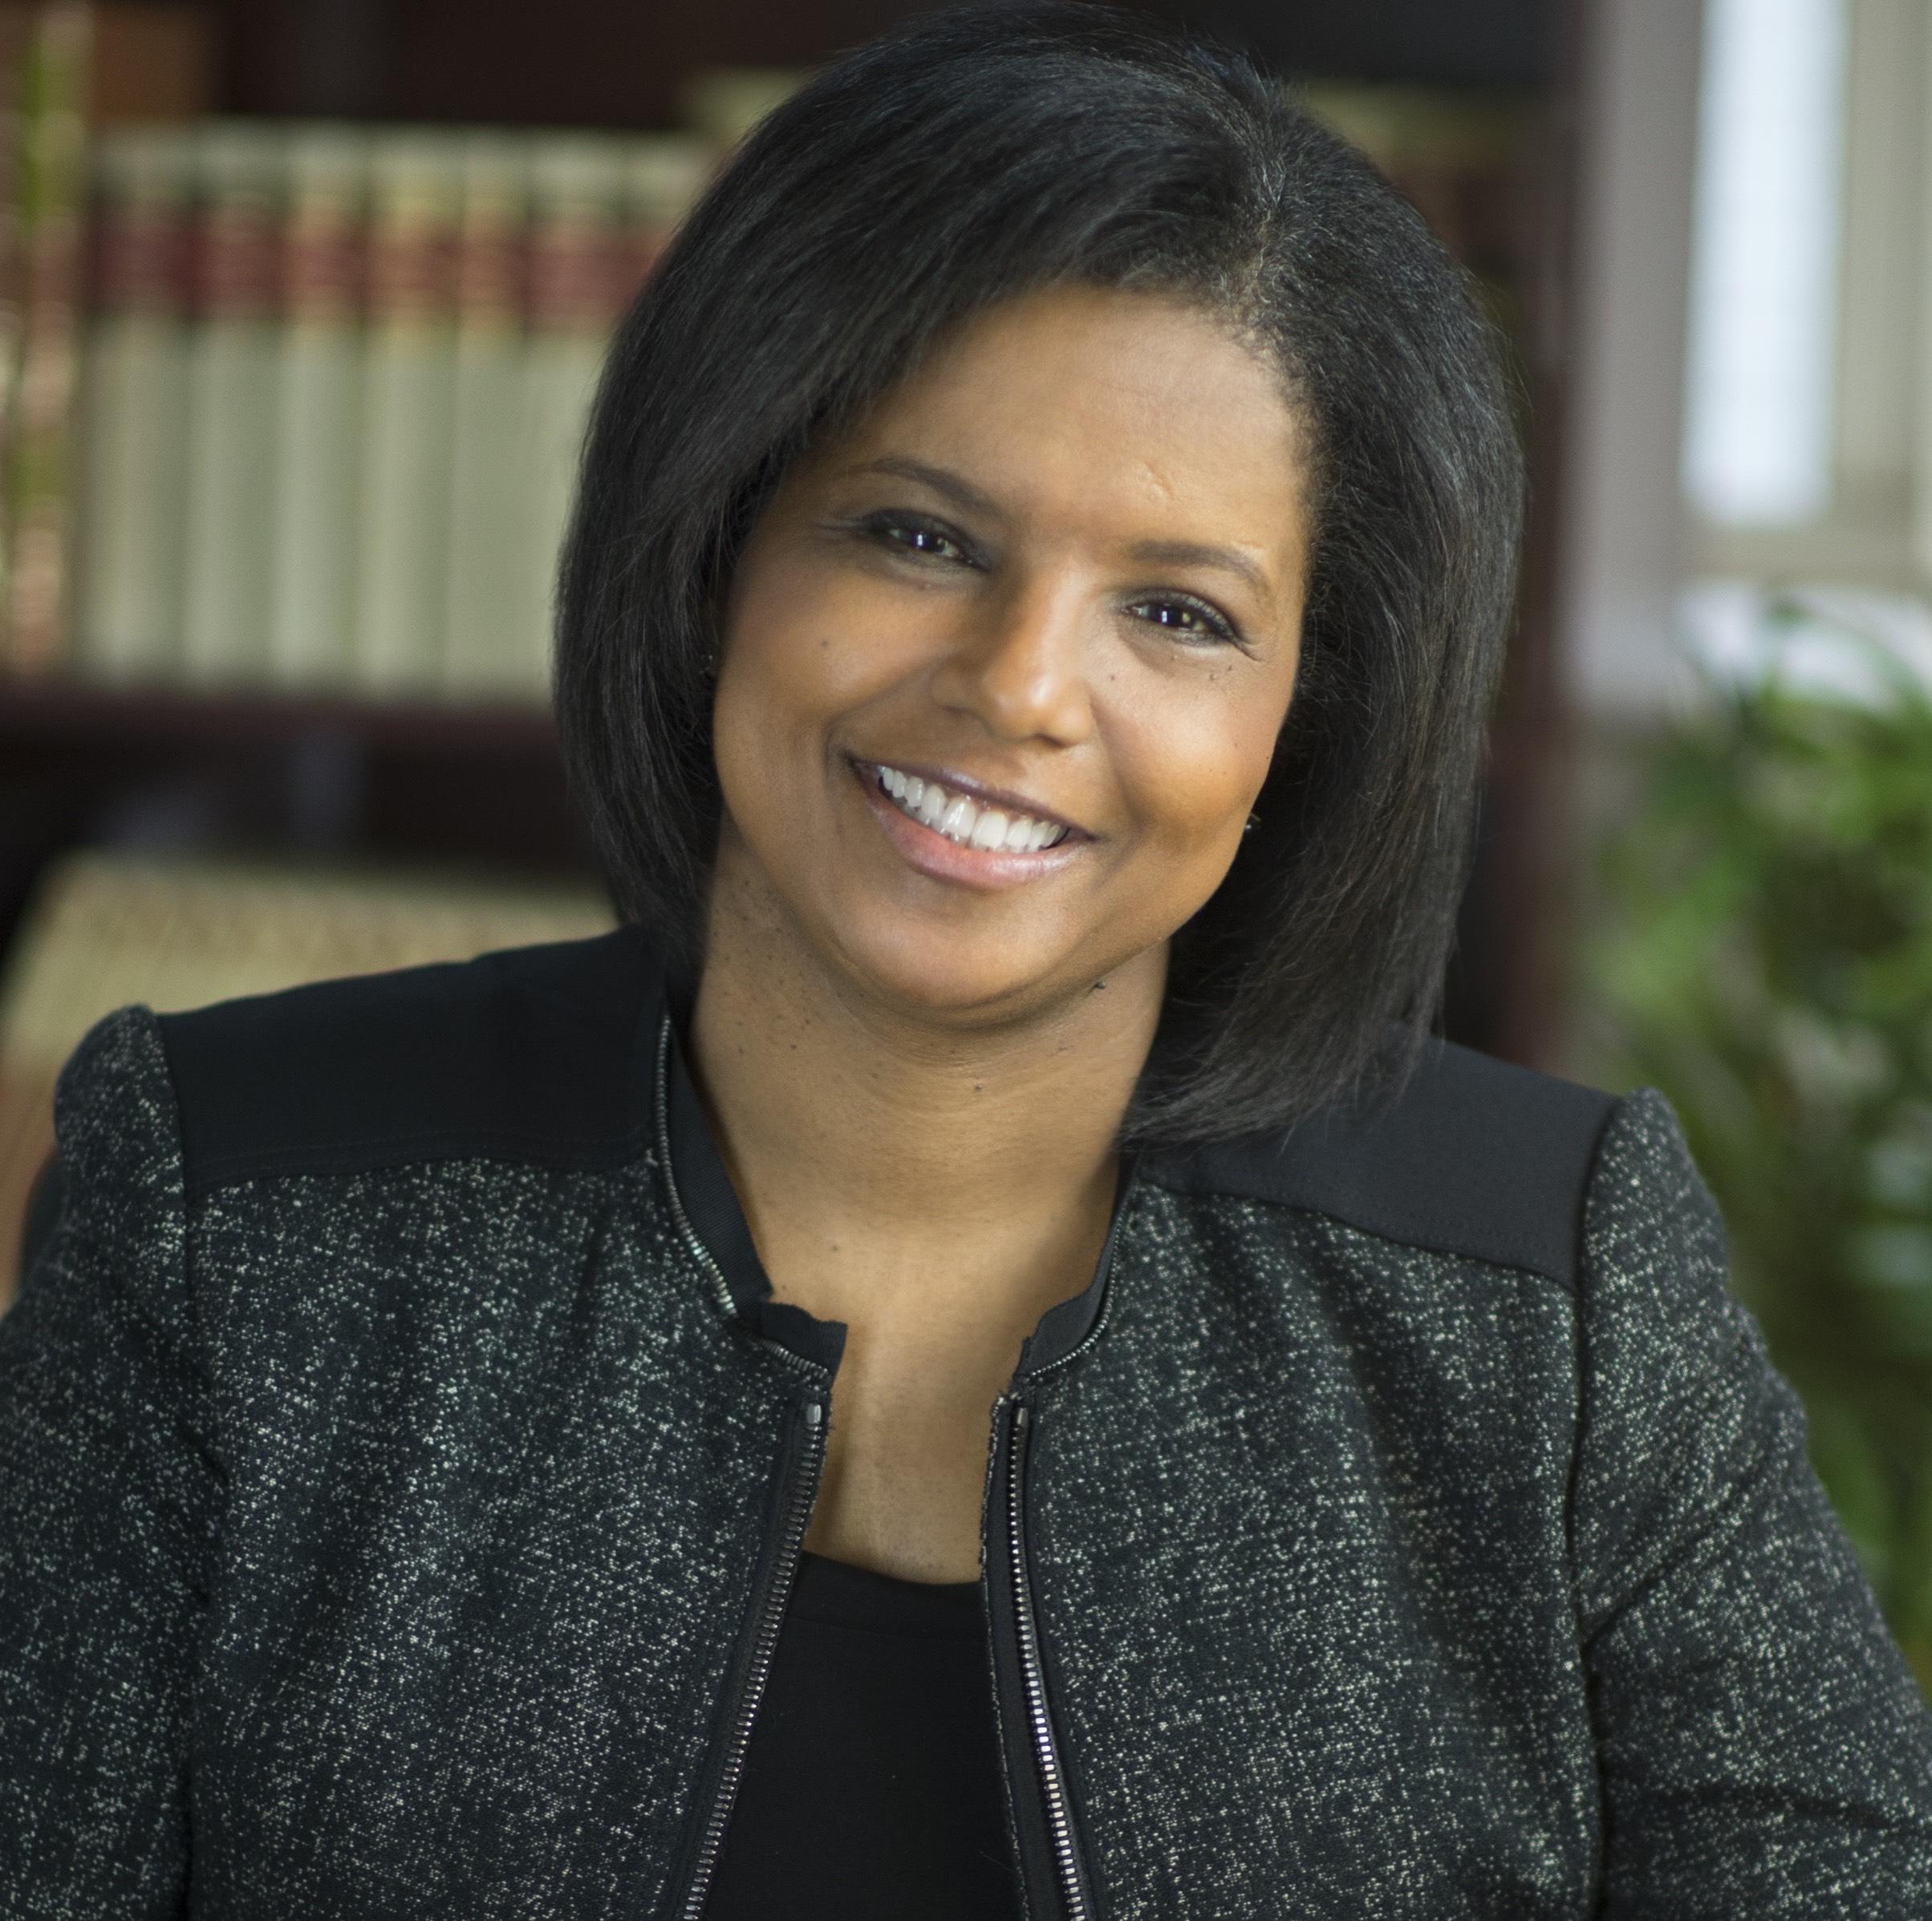 Professor Sheila R. Foster